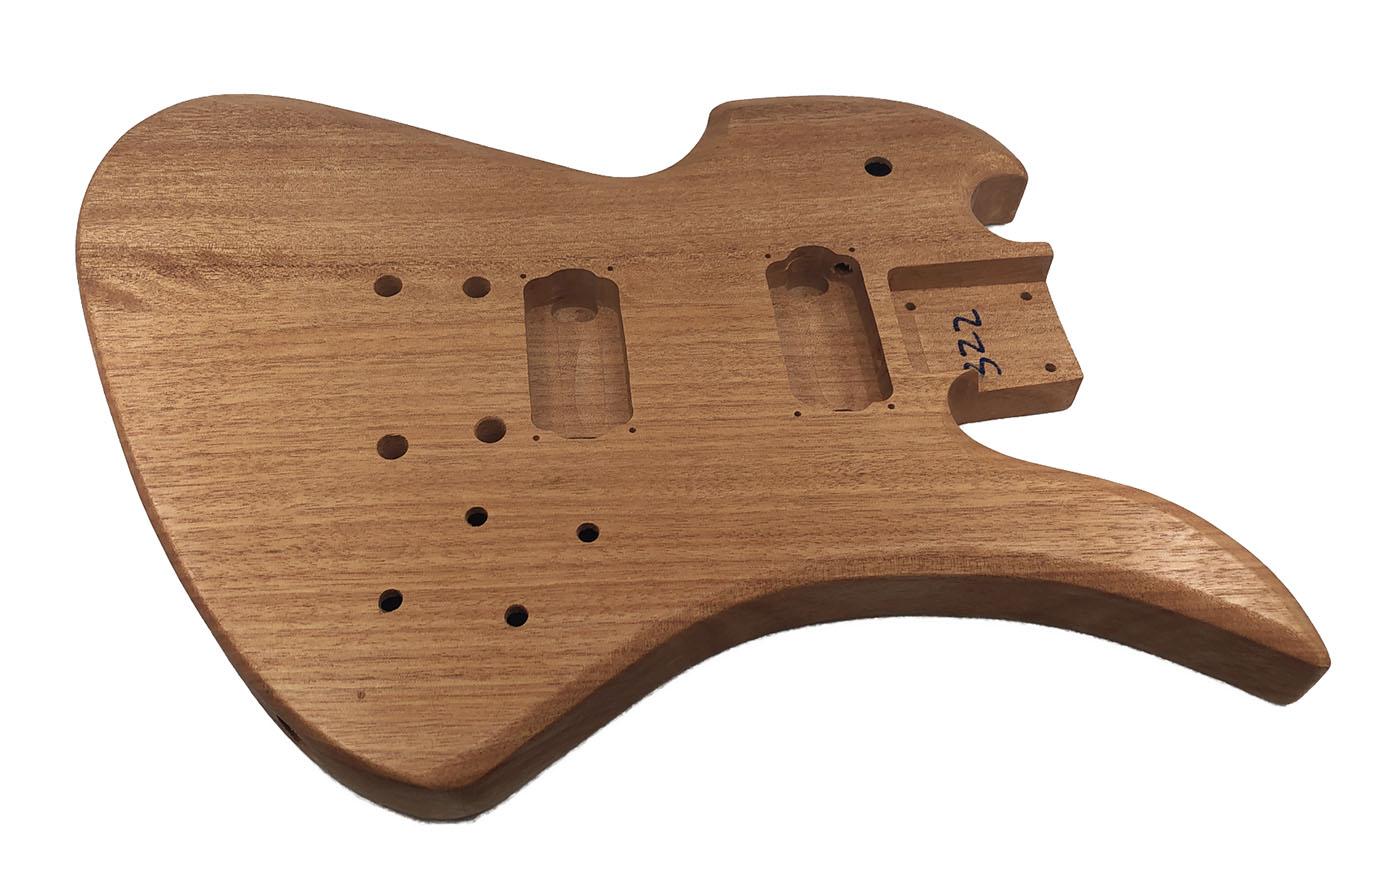 solo mbk 1 diy electric guitar kit solo music gear. Black Bedroom Furniture Sets. Home Design Ideas